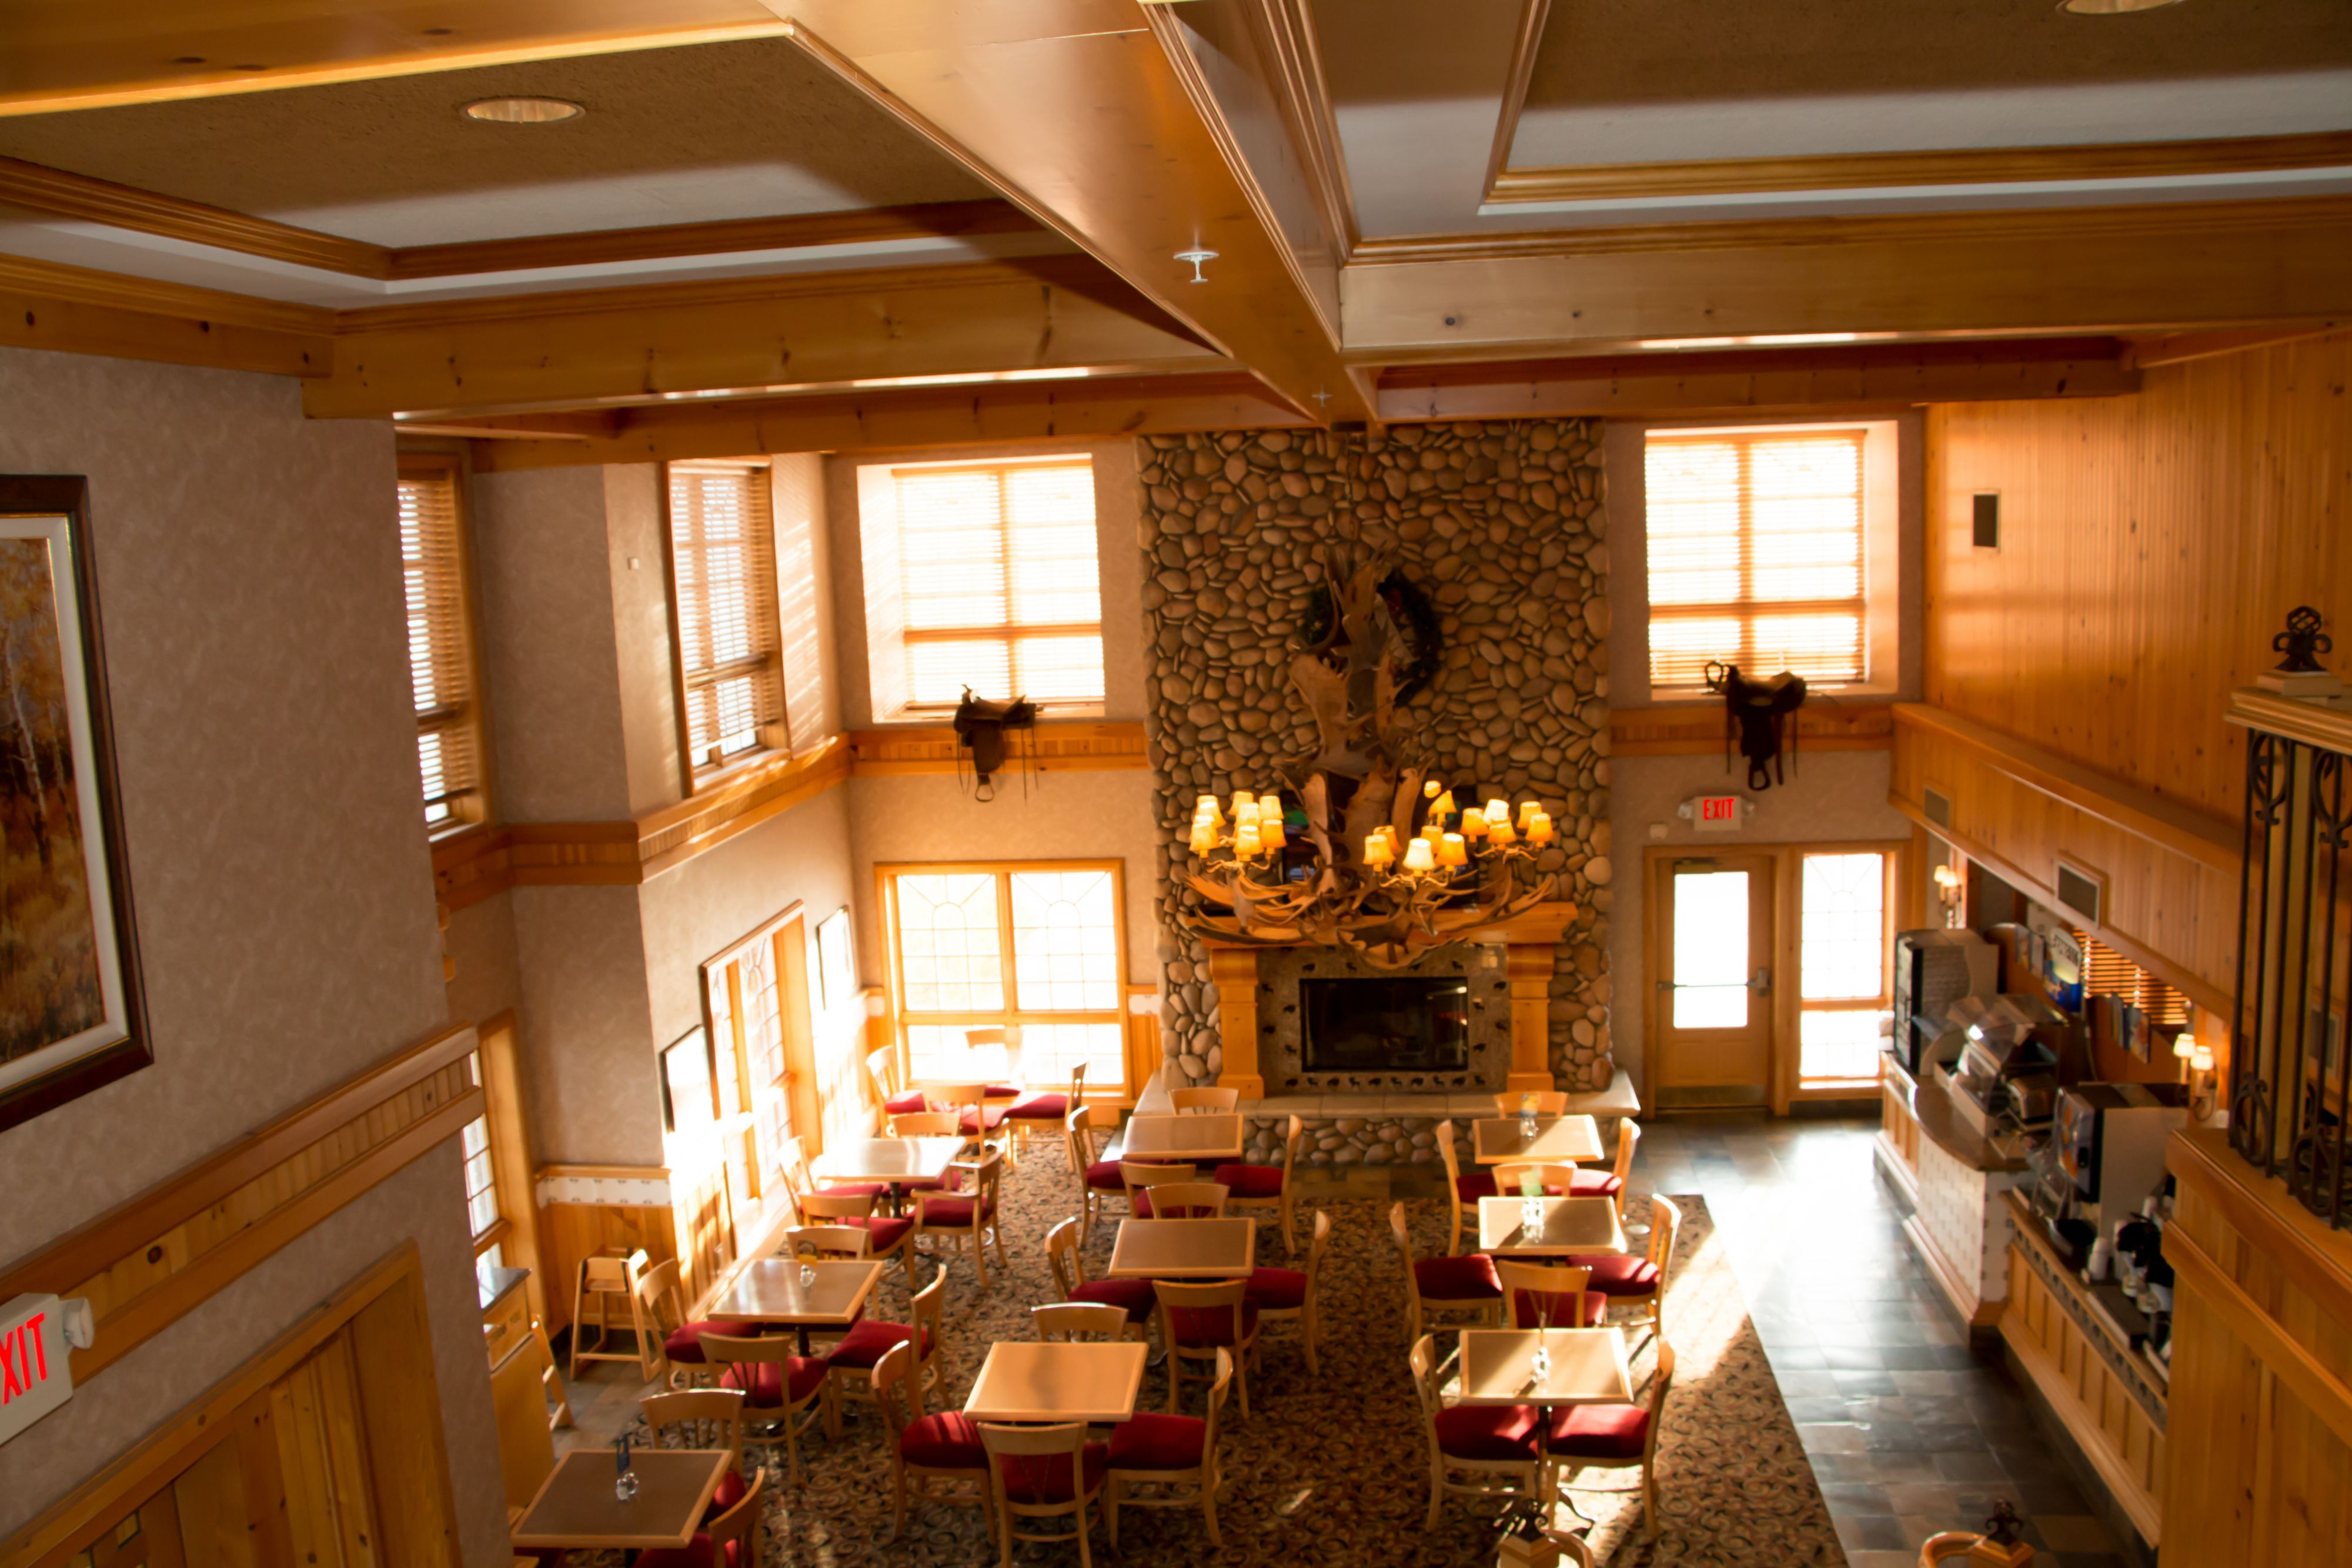 Holiday Inn Express & Suites Elko image 7